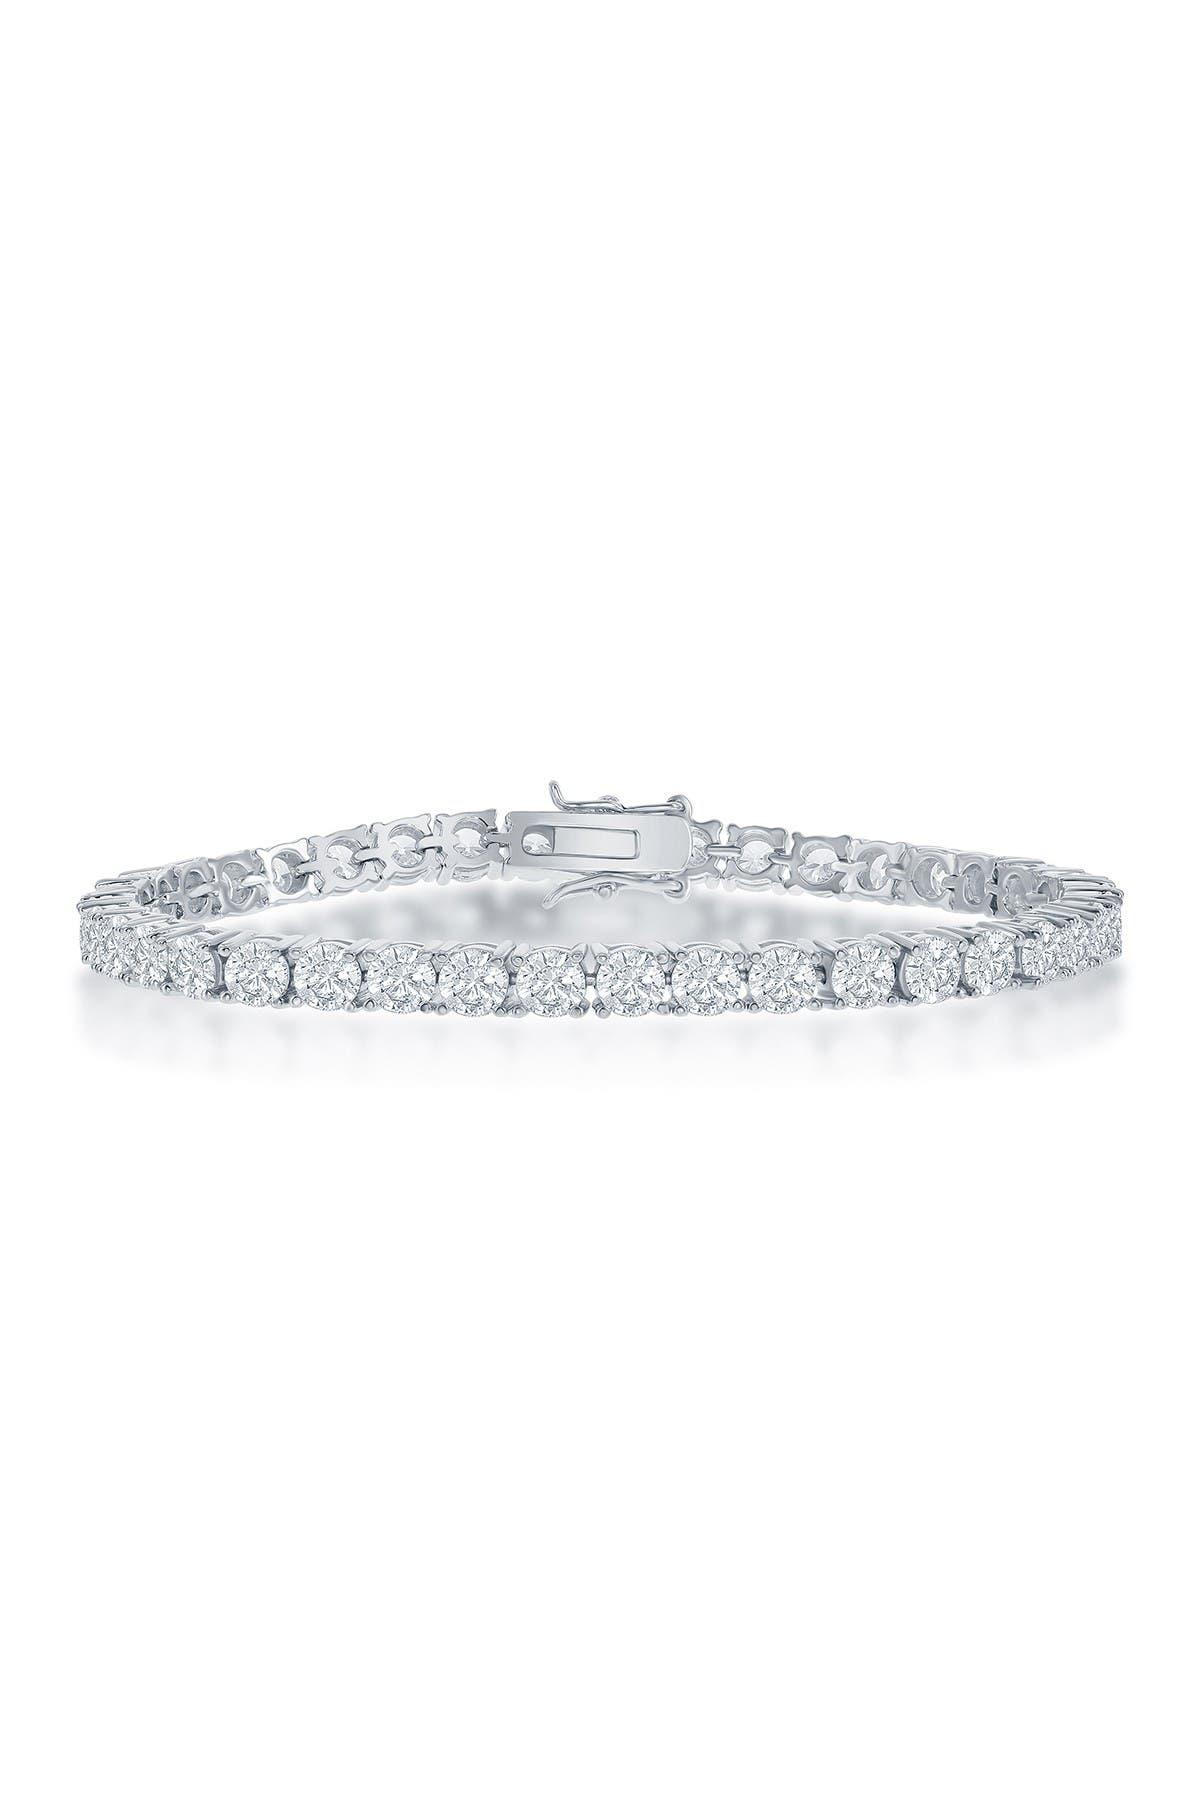 Image of Simona Jewelry Sterling Silver CZ Tennis Bracelet